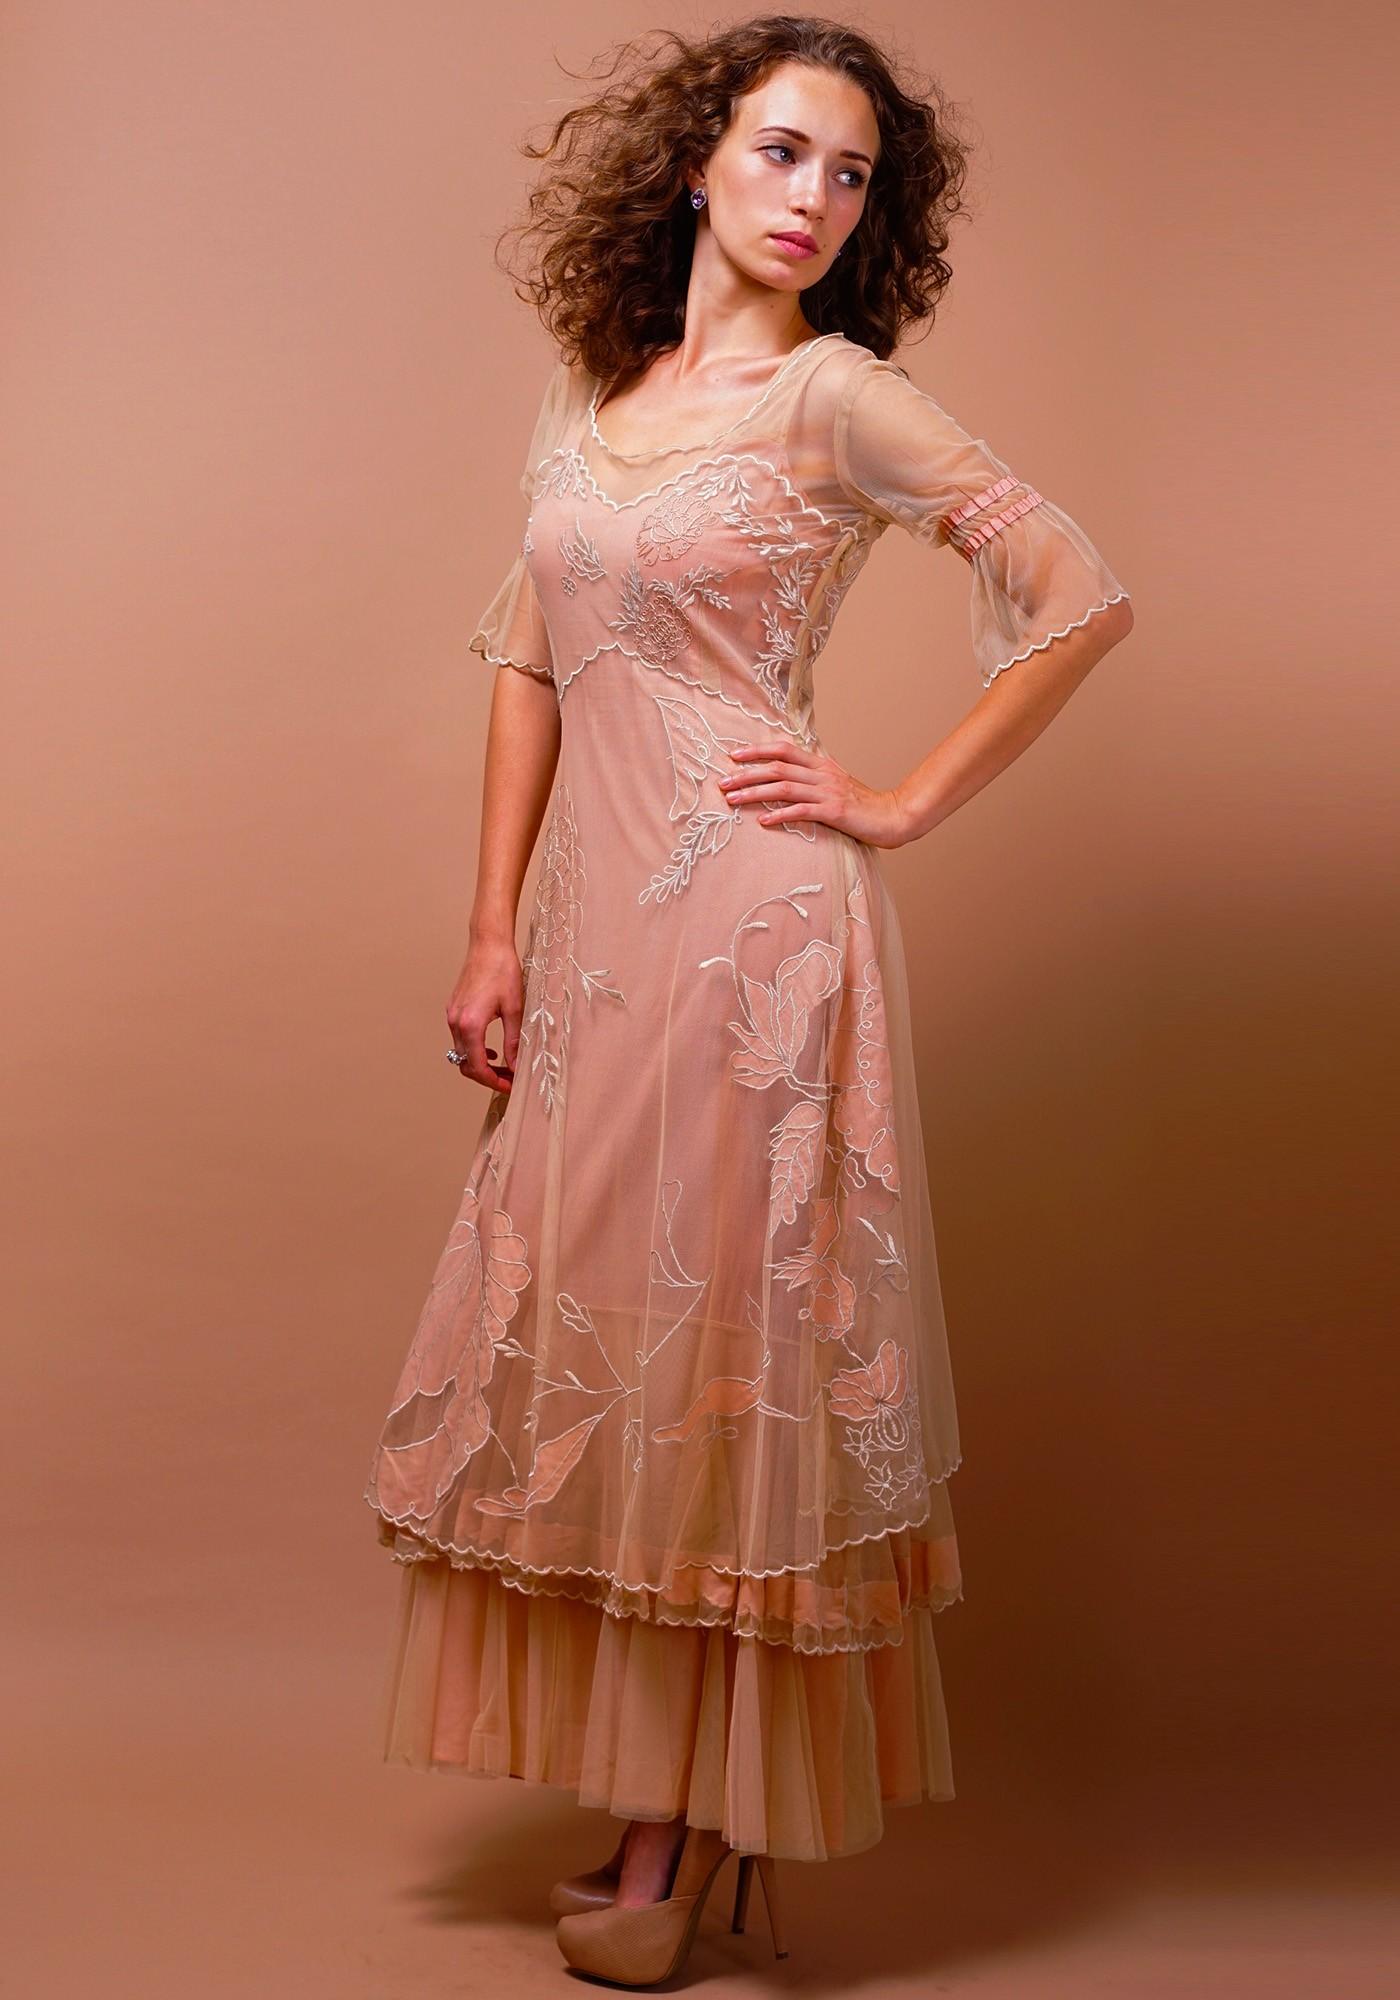 Titanic Tiered Vintage Wedding Dress in Pink-Champagne by Nataya